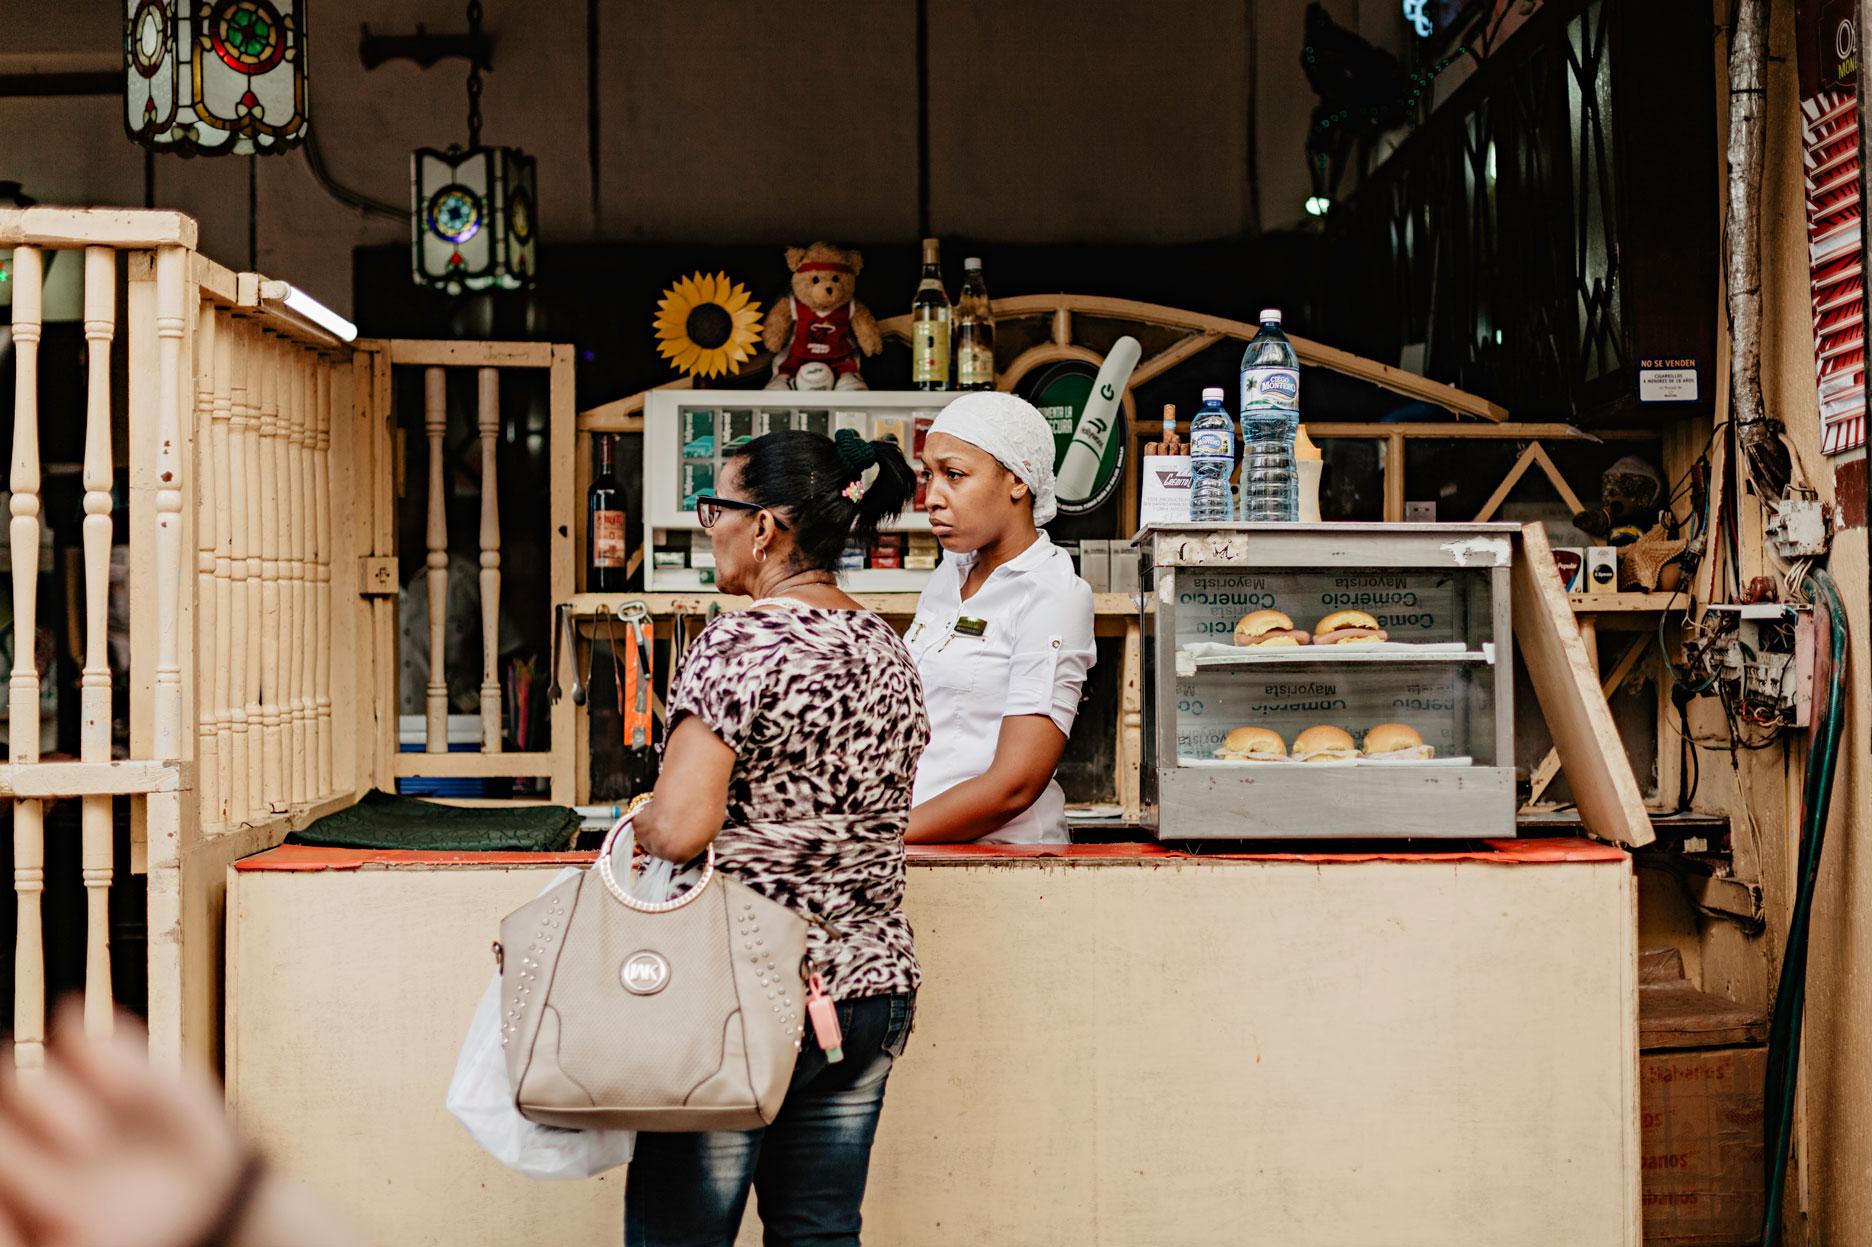 Tienda de La Habana